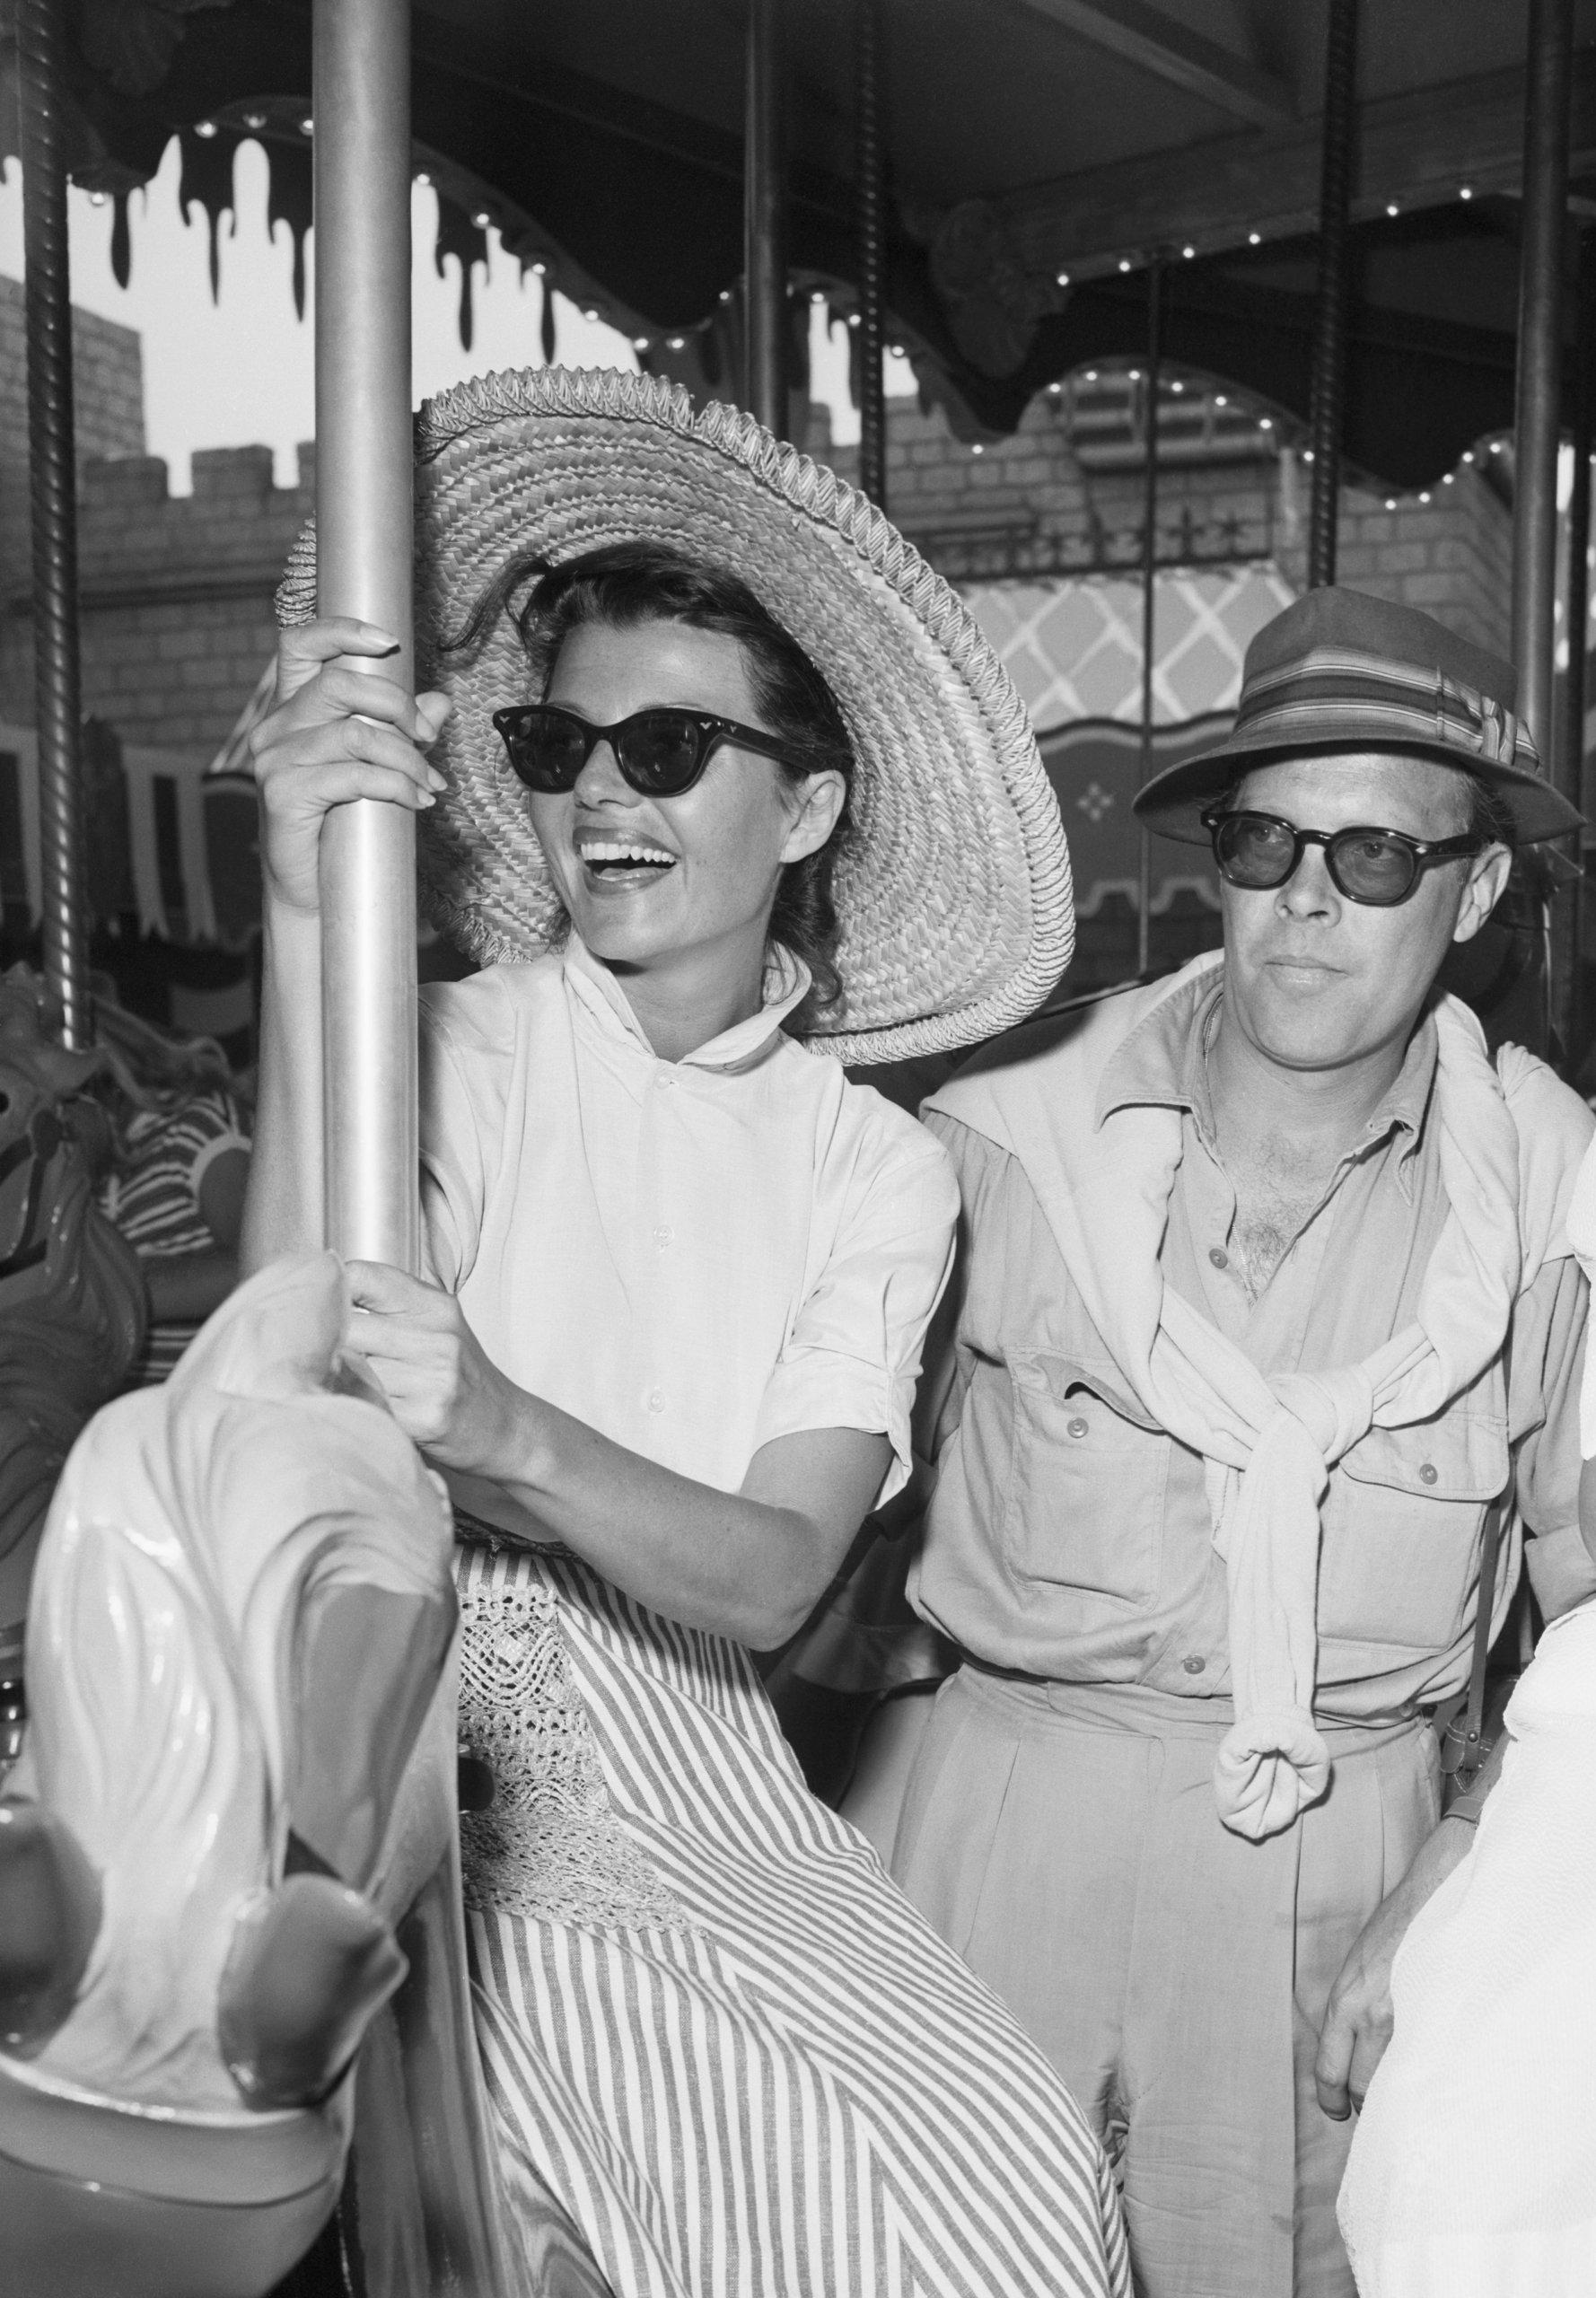 Dick Haymes and Rita Hayworth on Carousel